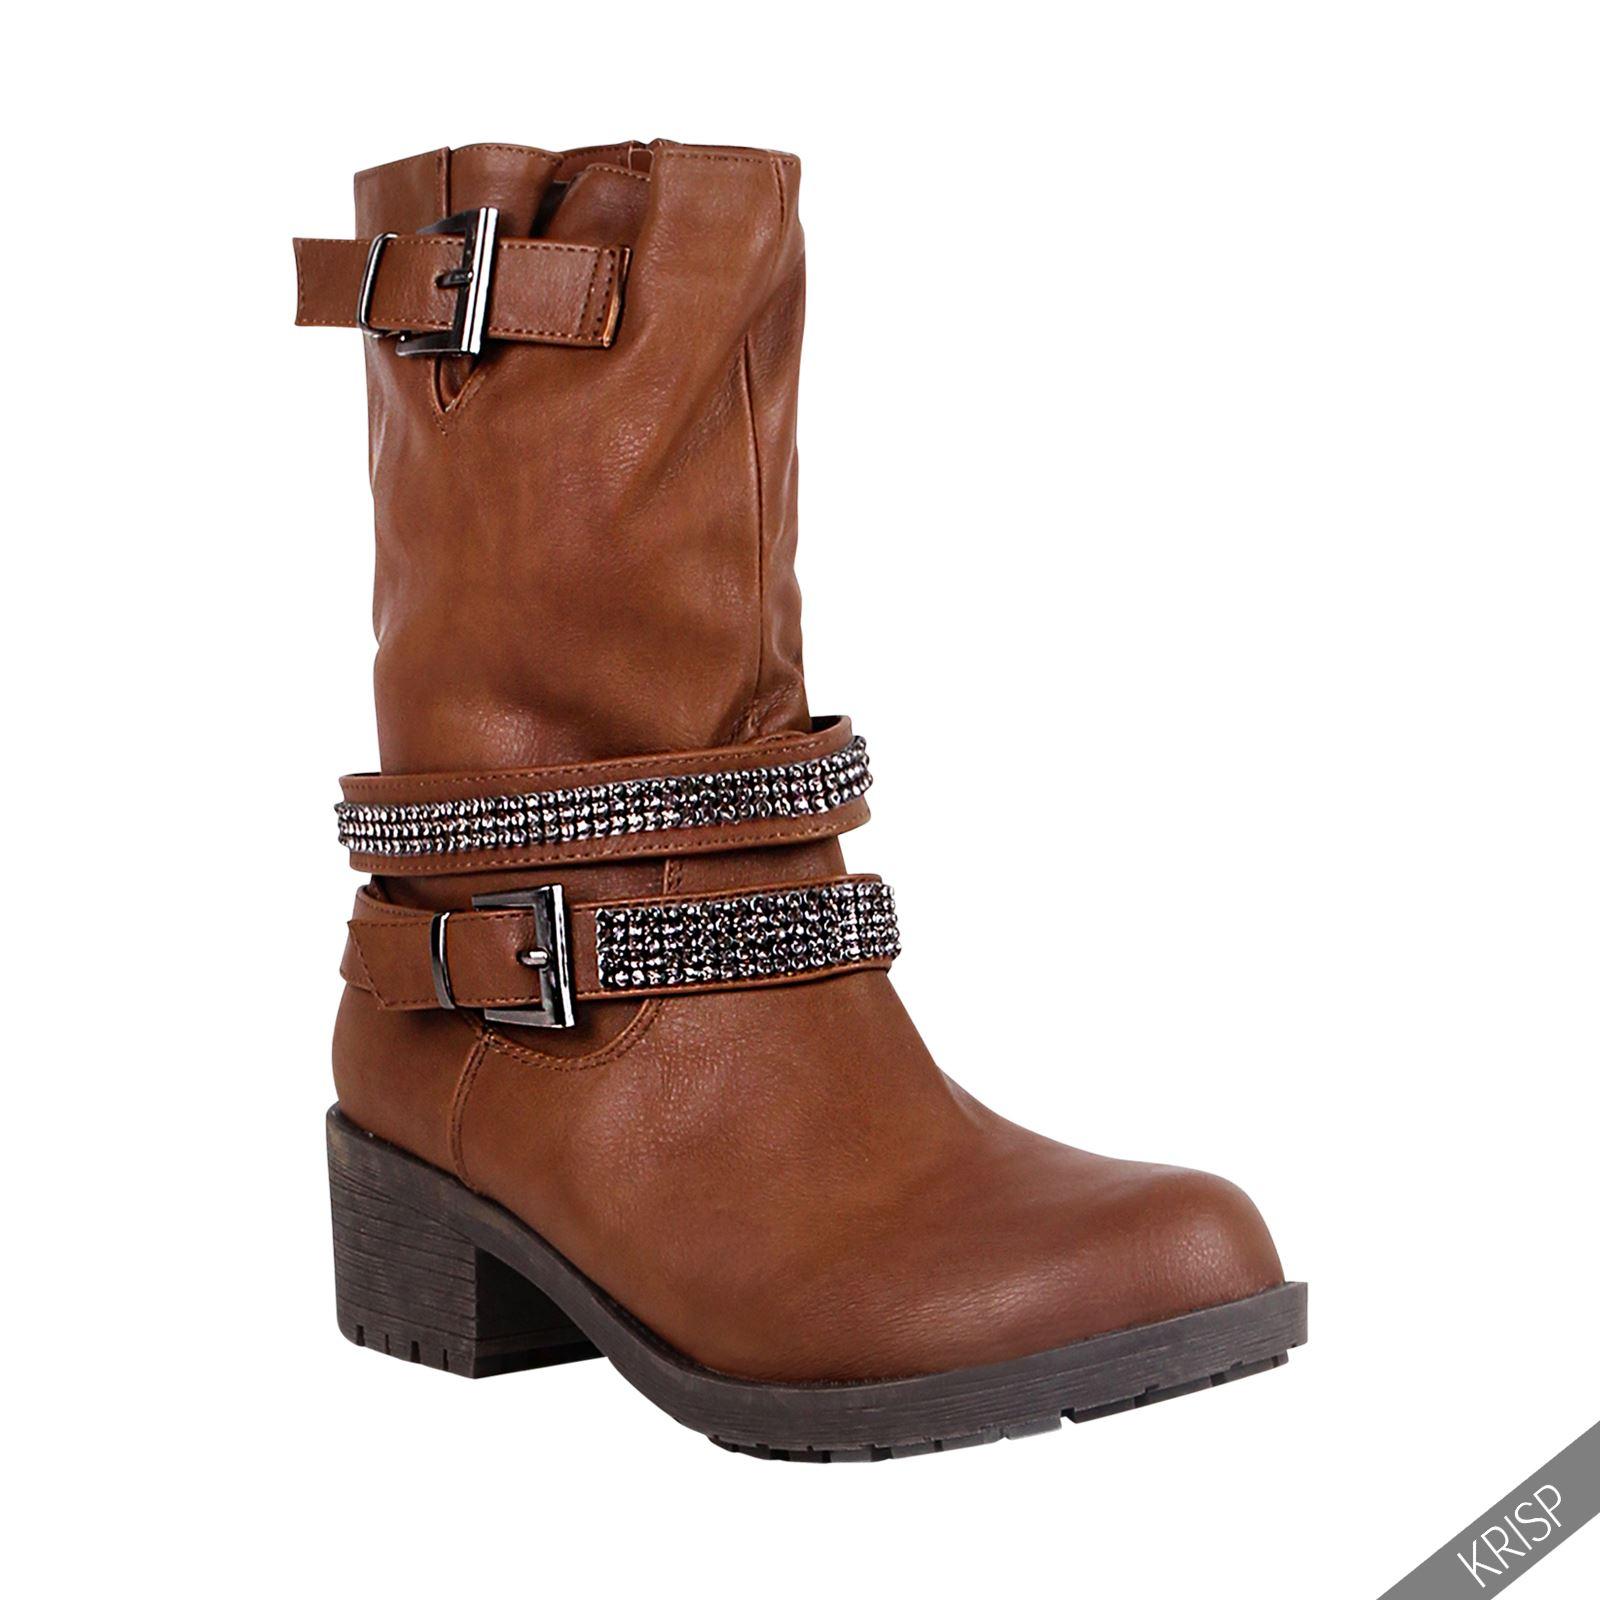 femmes bottes low boots rembourr es talon carr strass. Black Bedroom Furniture Sets. Home Design Ideas